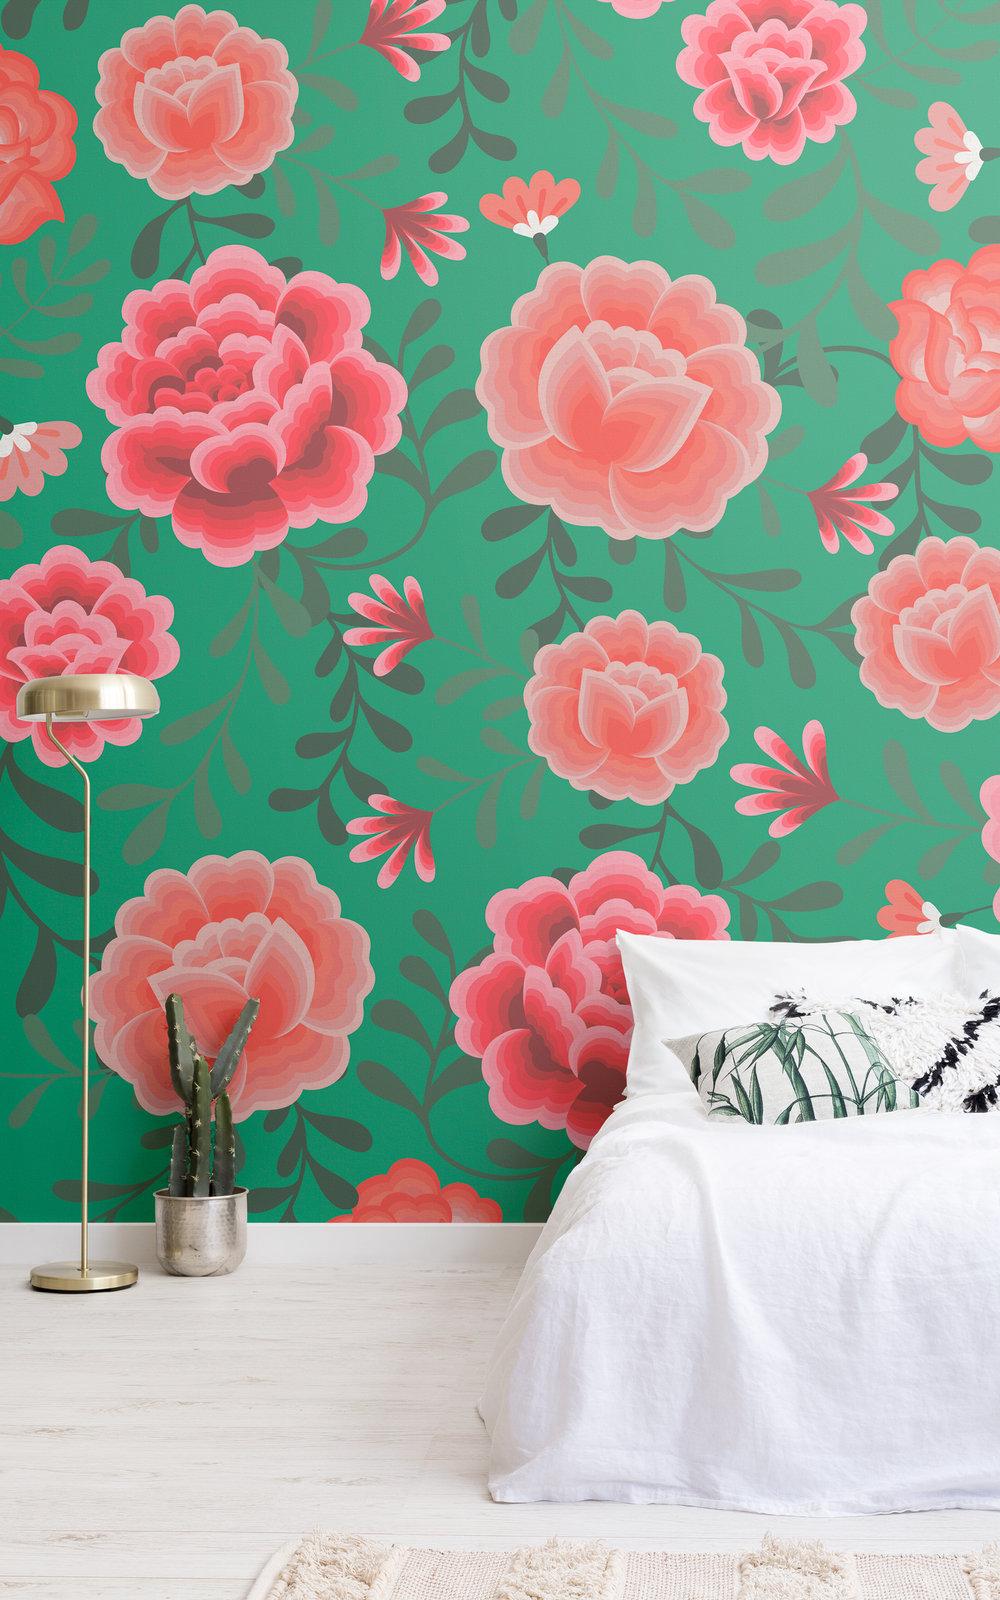 Frida-Kahlo-green-floral-pattern-lifestyle-Web.jpg